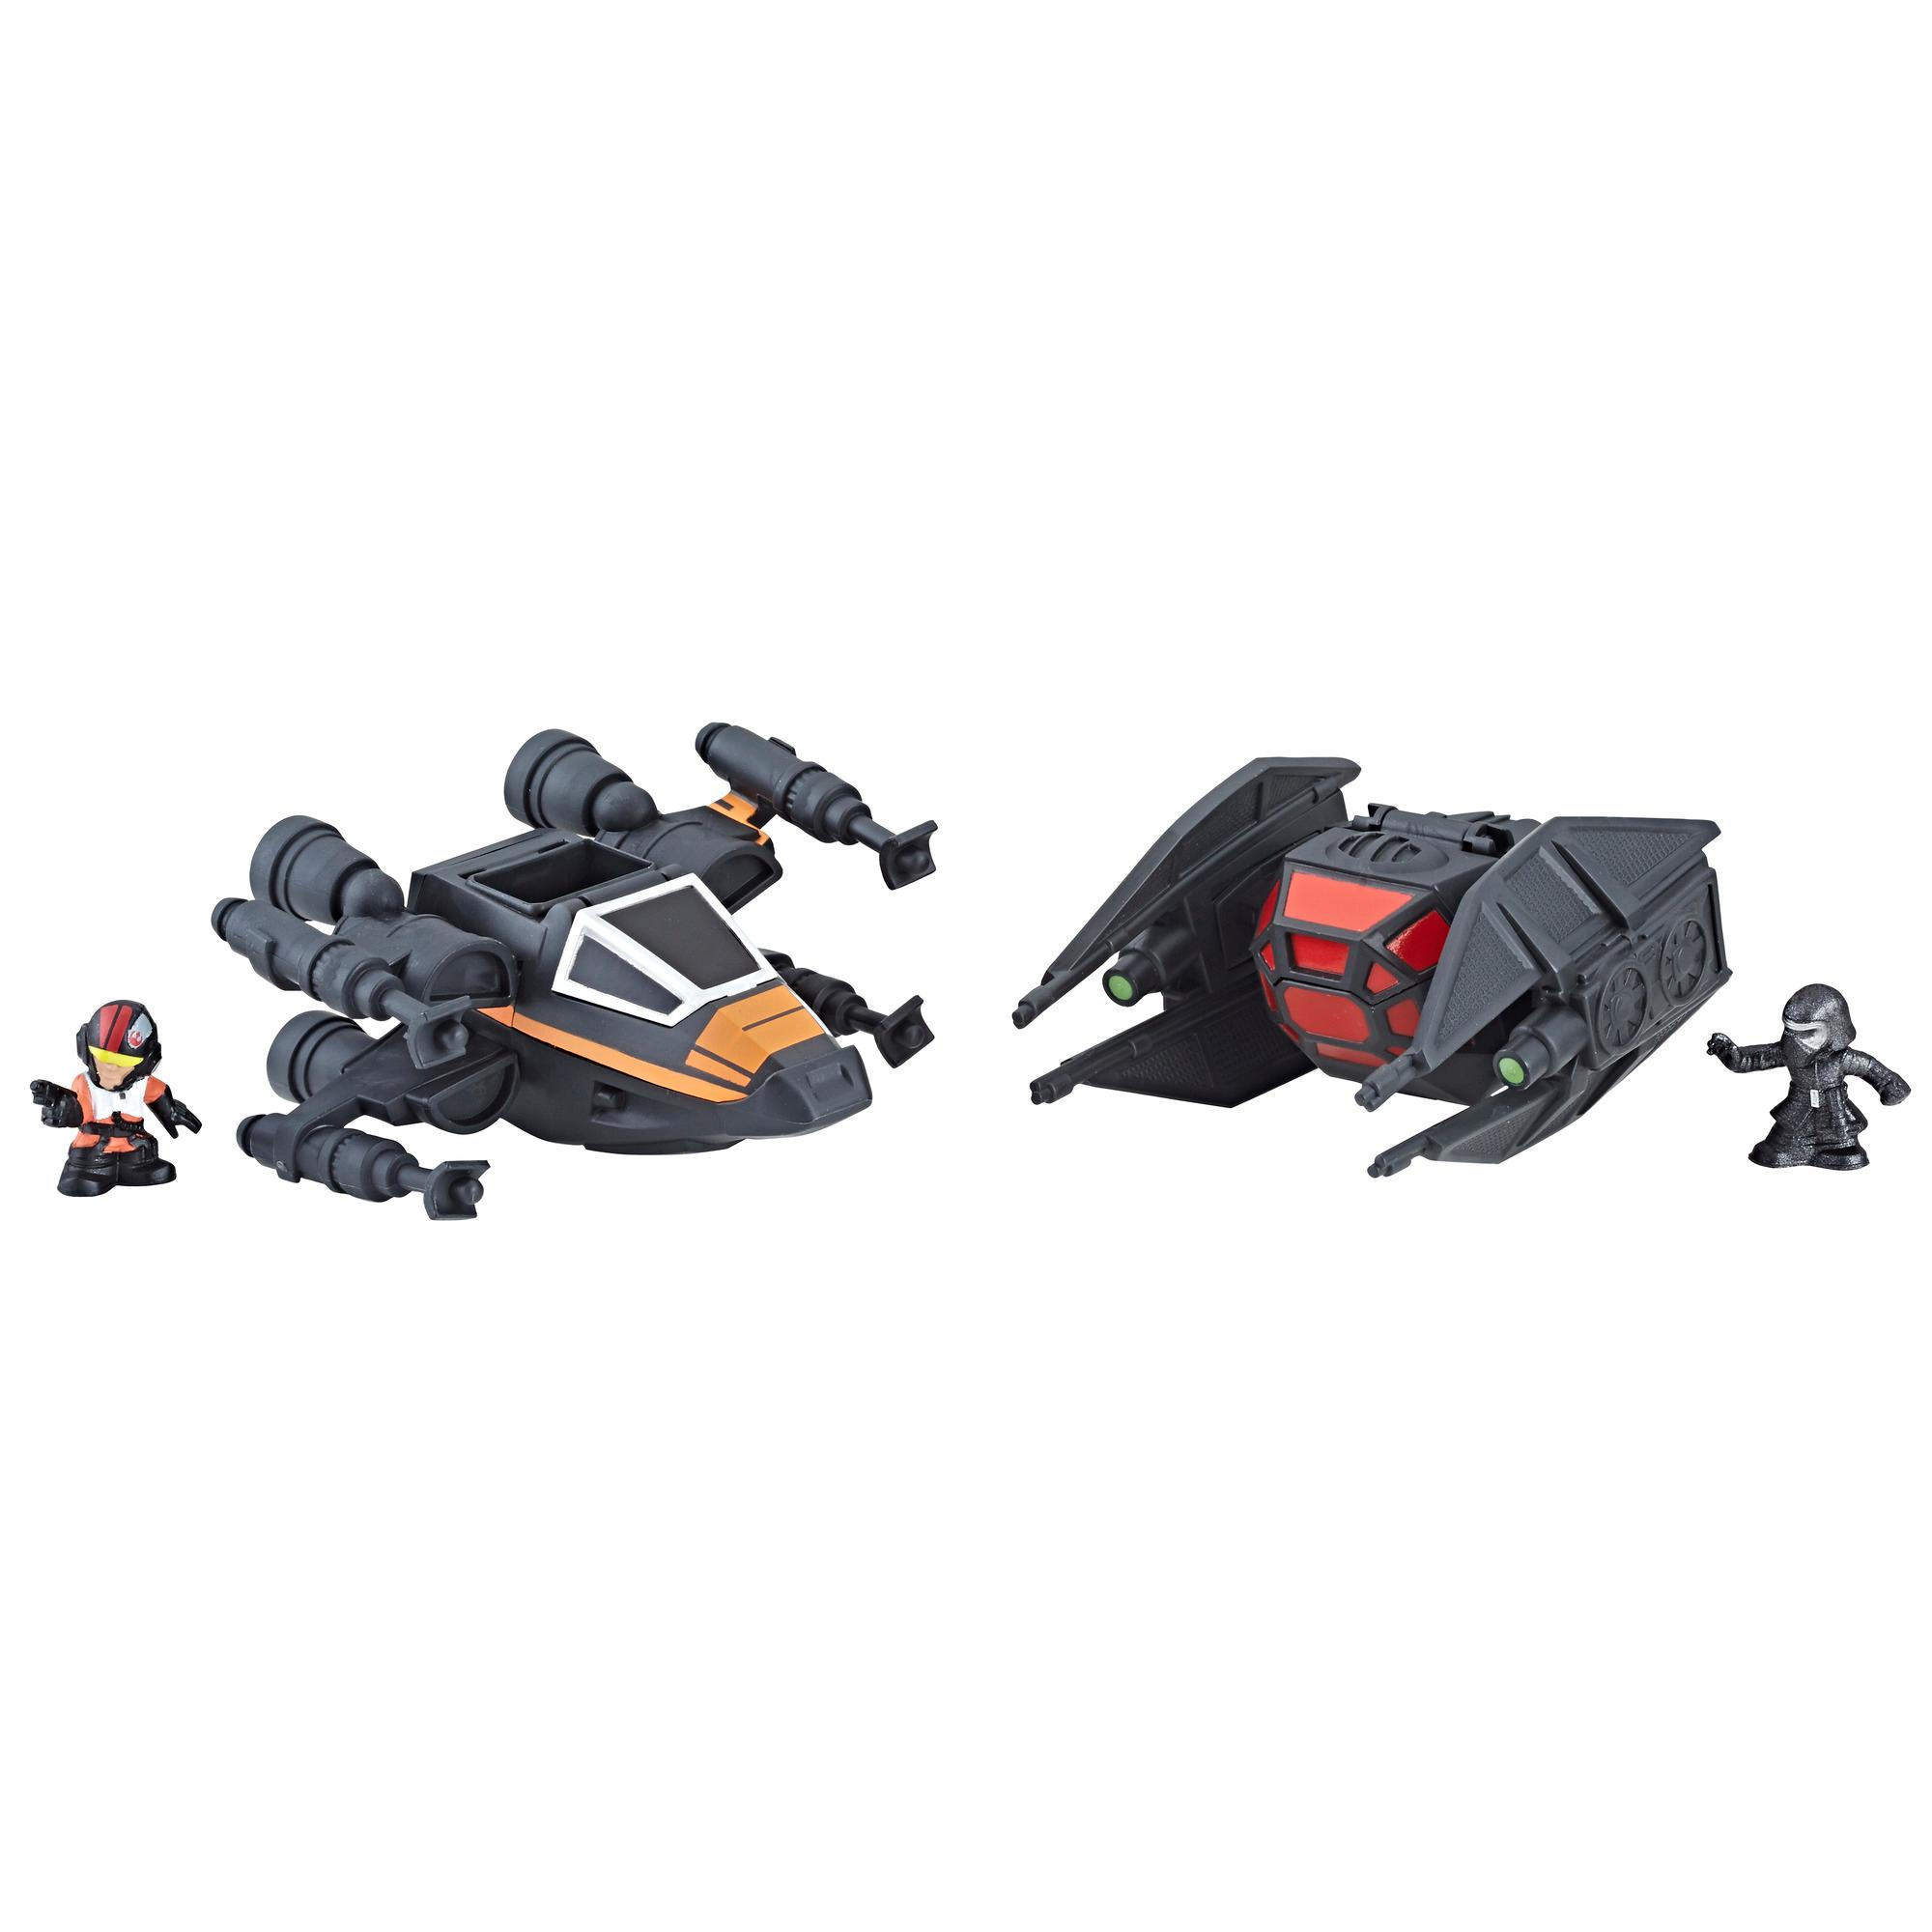 Star Wars Micro Force - Duo chasseur X-wing de Poe vs. TIE Silencer de Kylo Ren